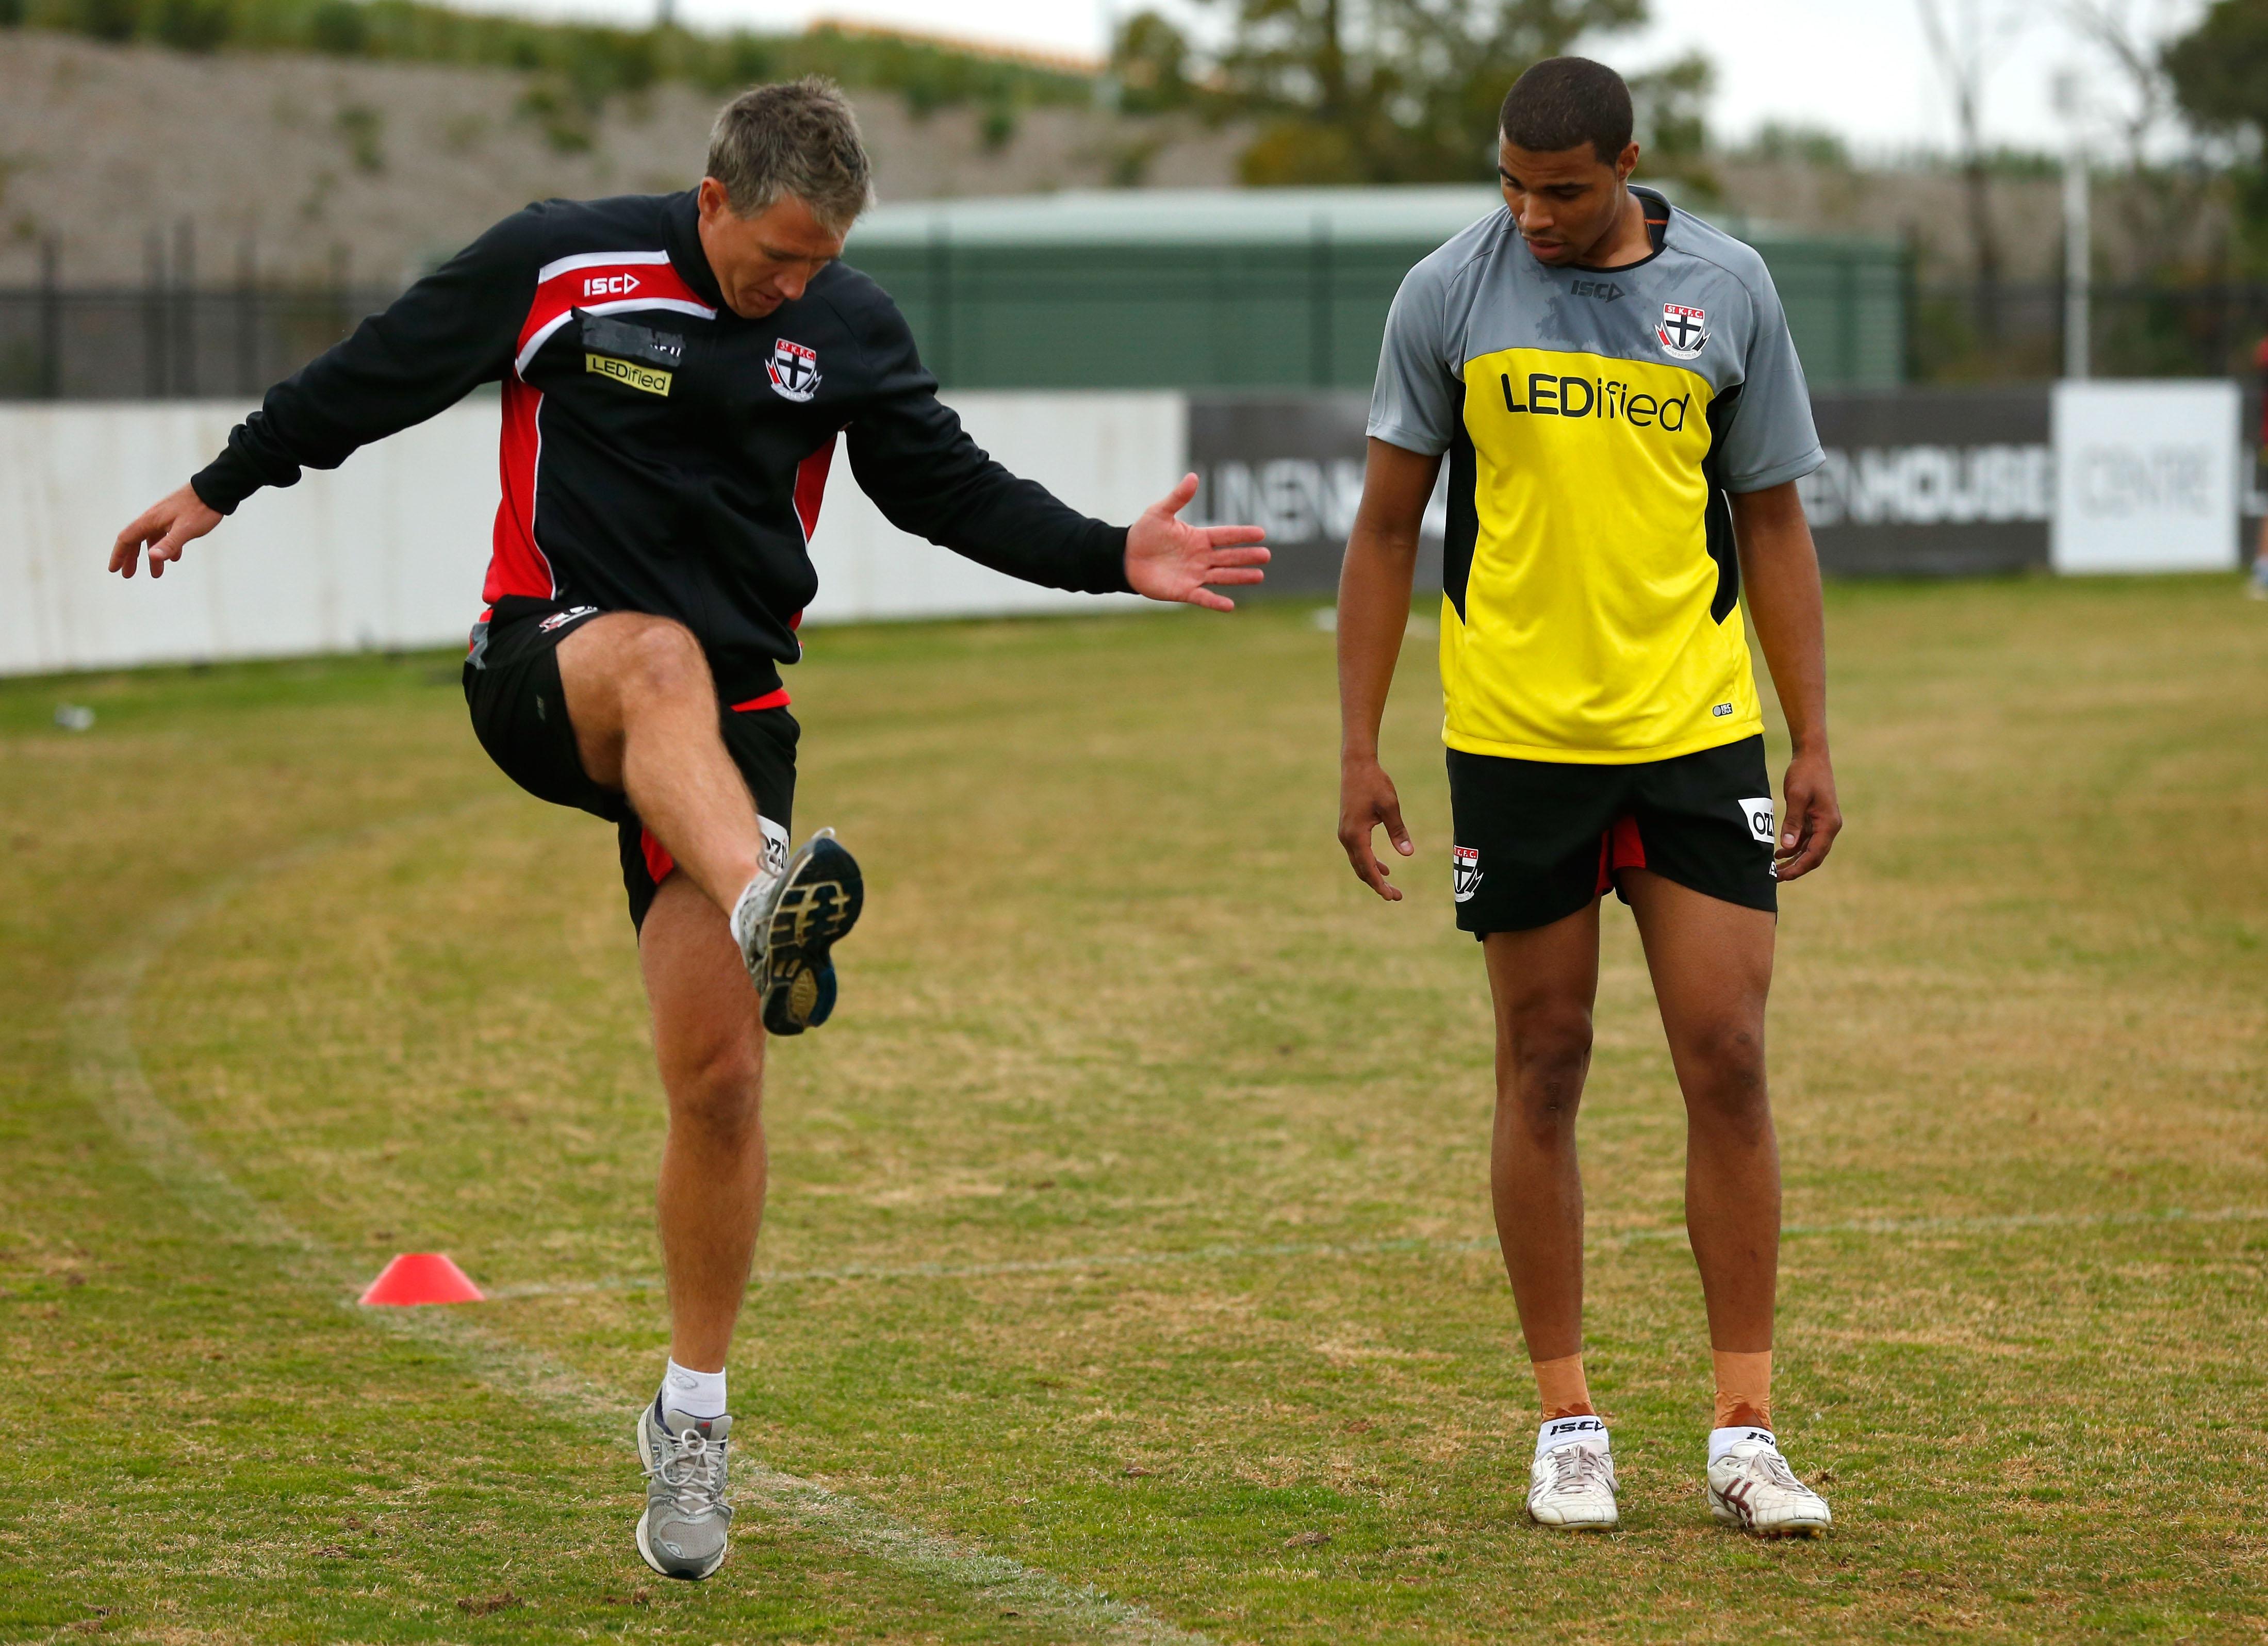 AFL 2013 Training - St Kilda 081113